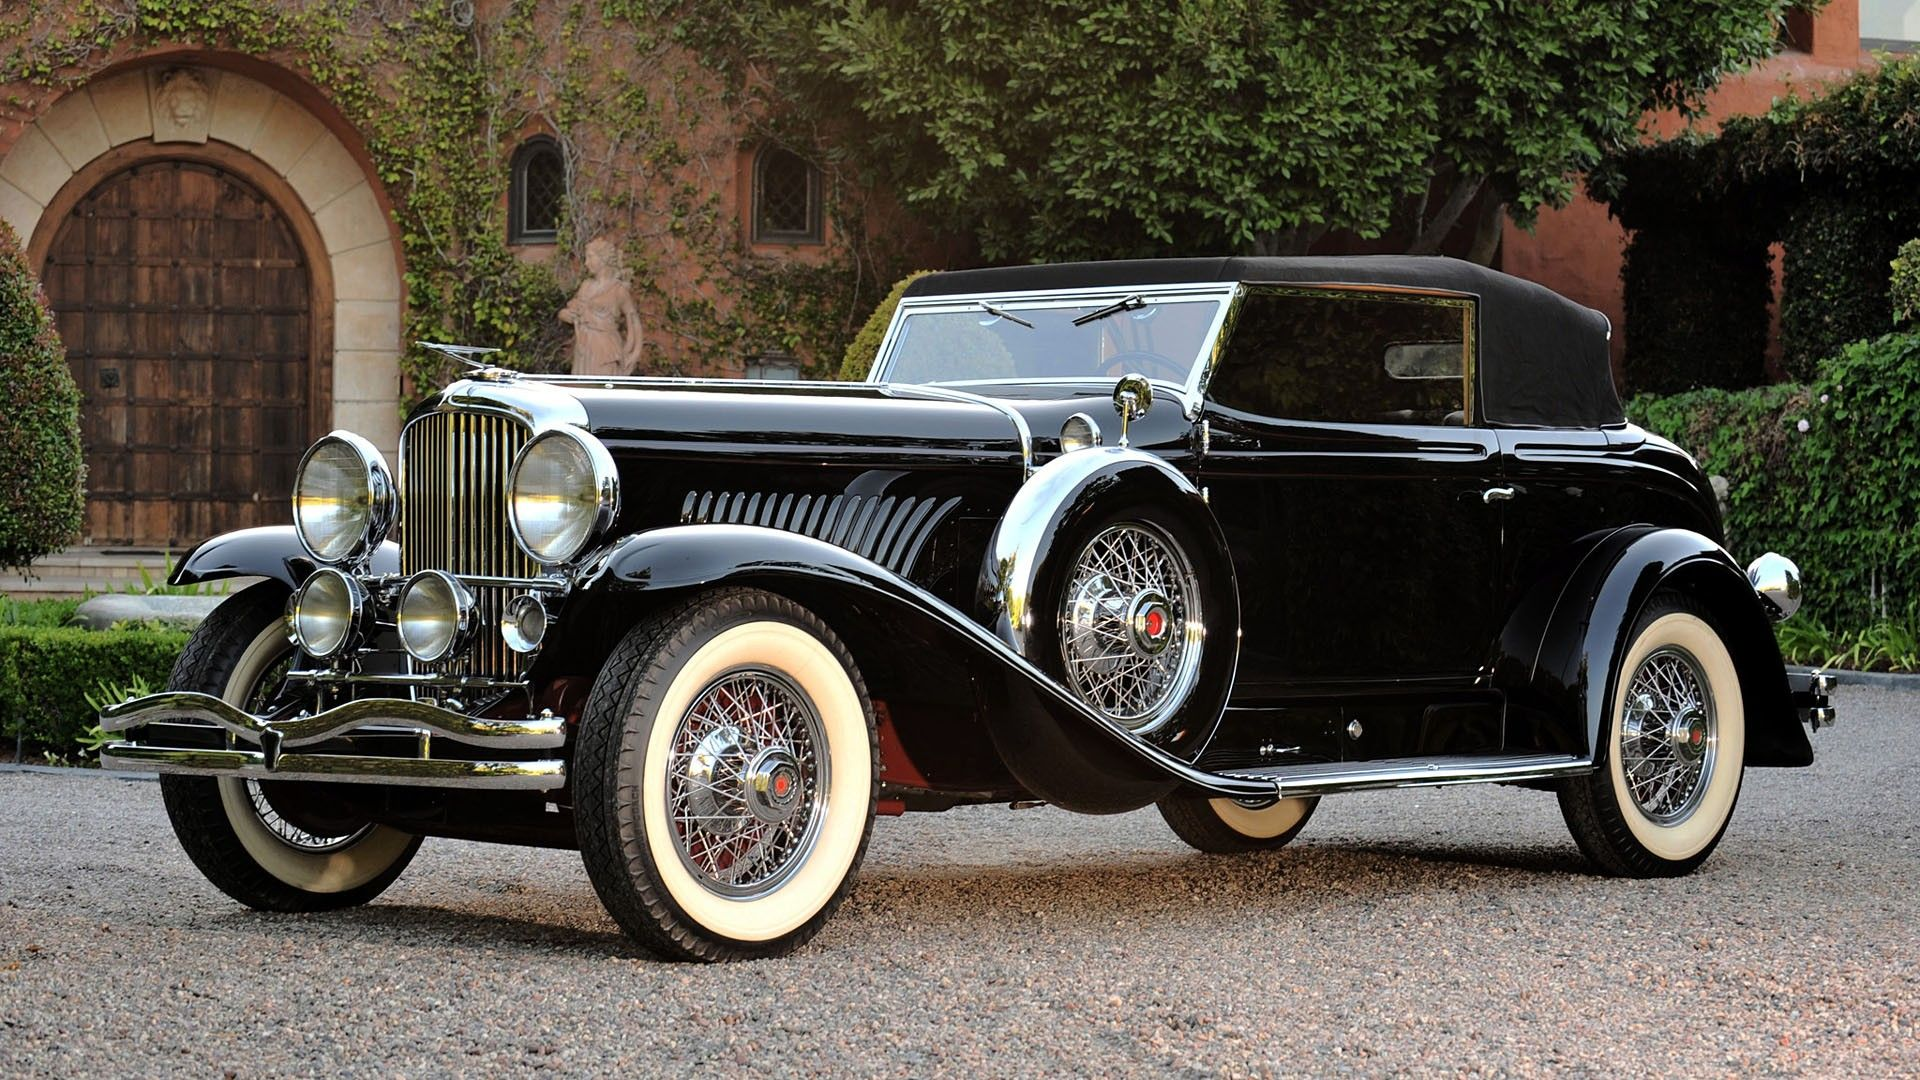 vehicle for sale, money rewarding, vintage | Retro Auto ...